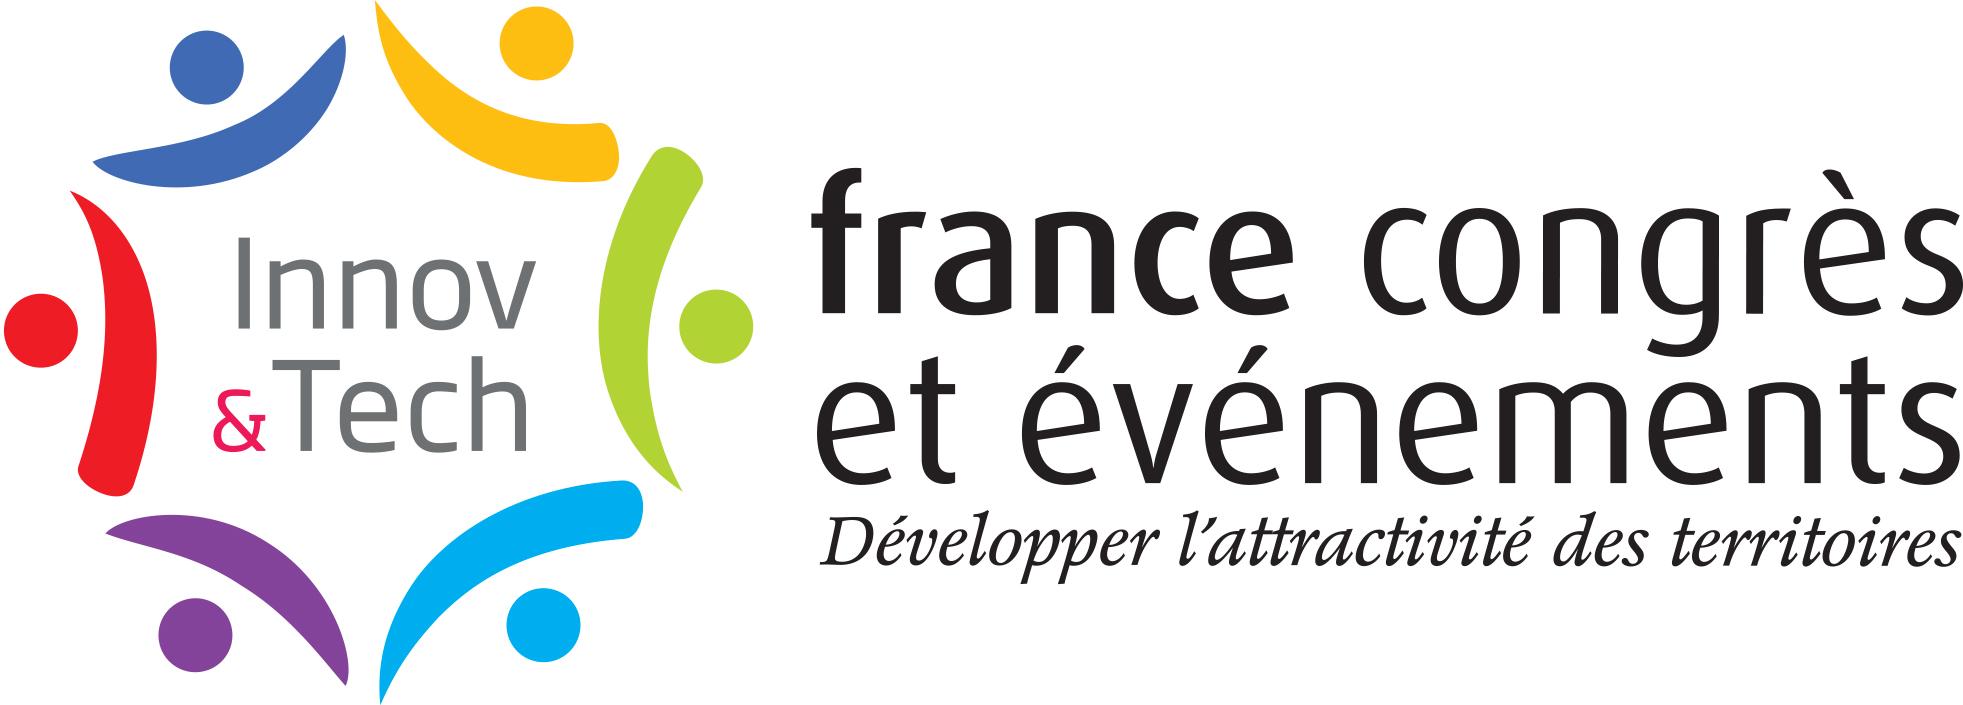 Francecongresnouveaulogo2017cmjnhorizontalinnov1530112474153011247415307854741530785474